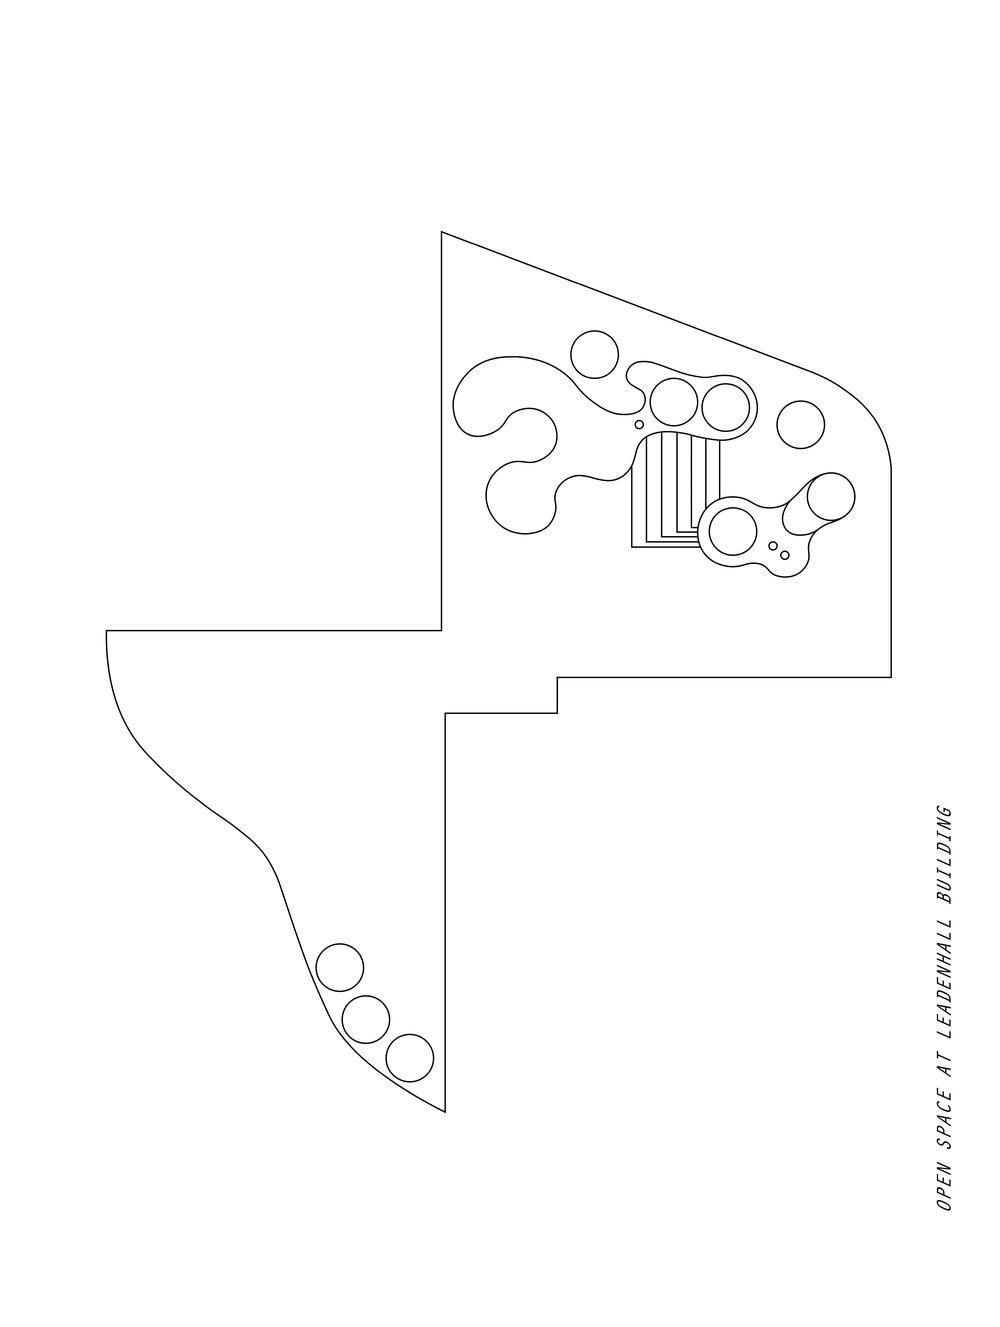 second book16.jpg